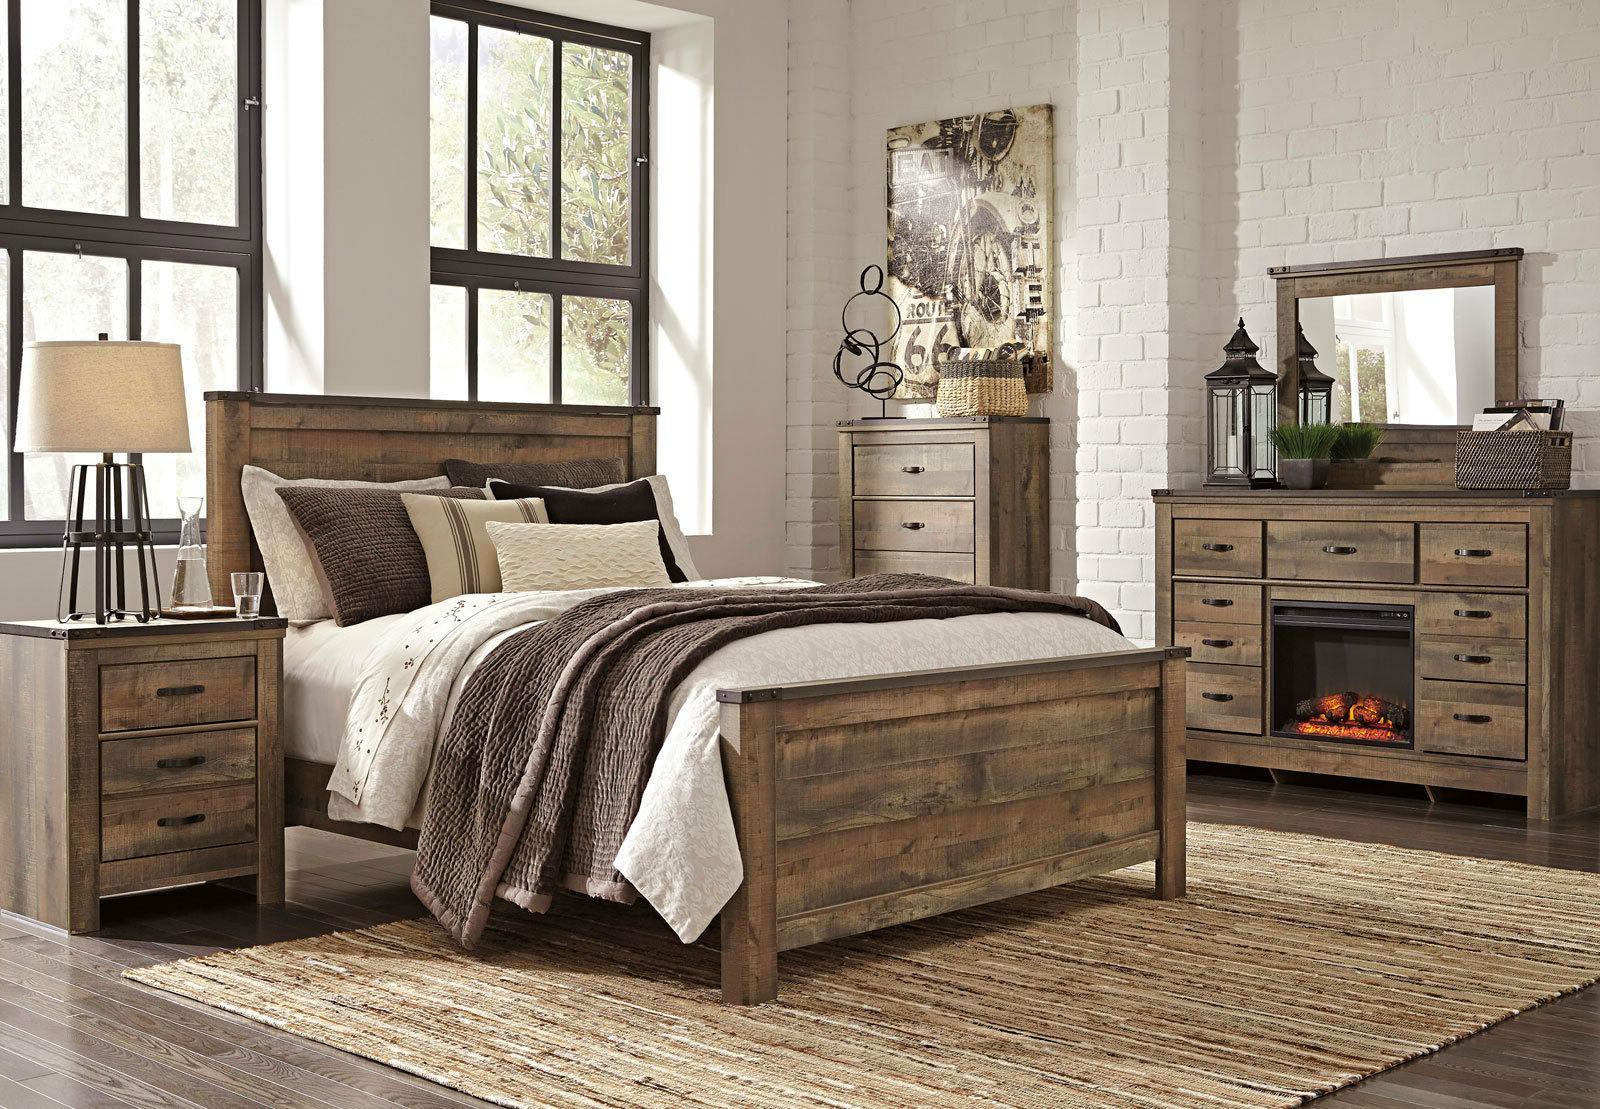 Ashley Furniture B446 Trinell - Modern Queen or King Panel B